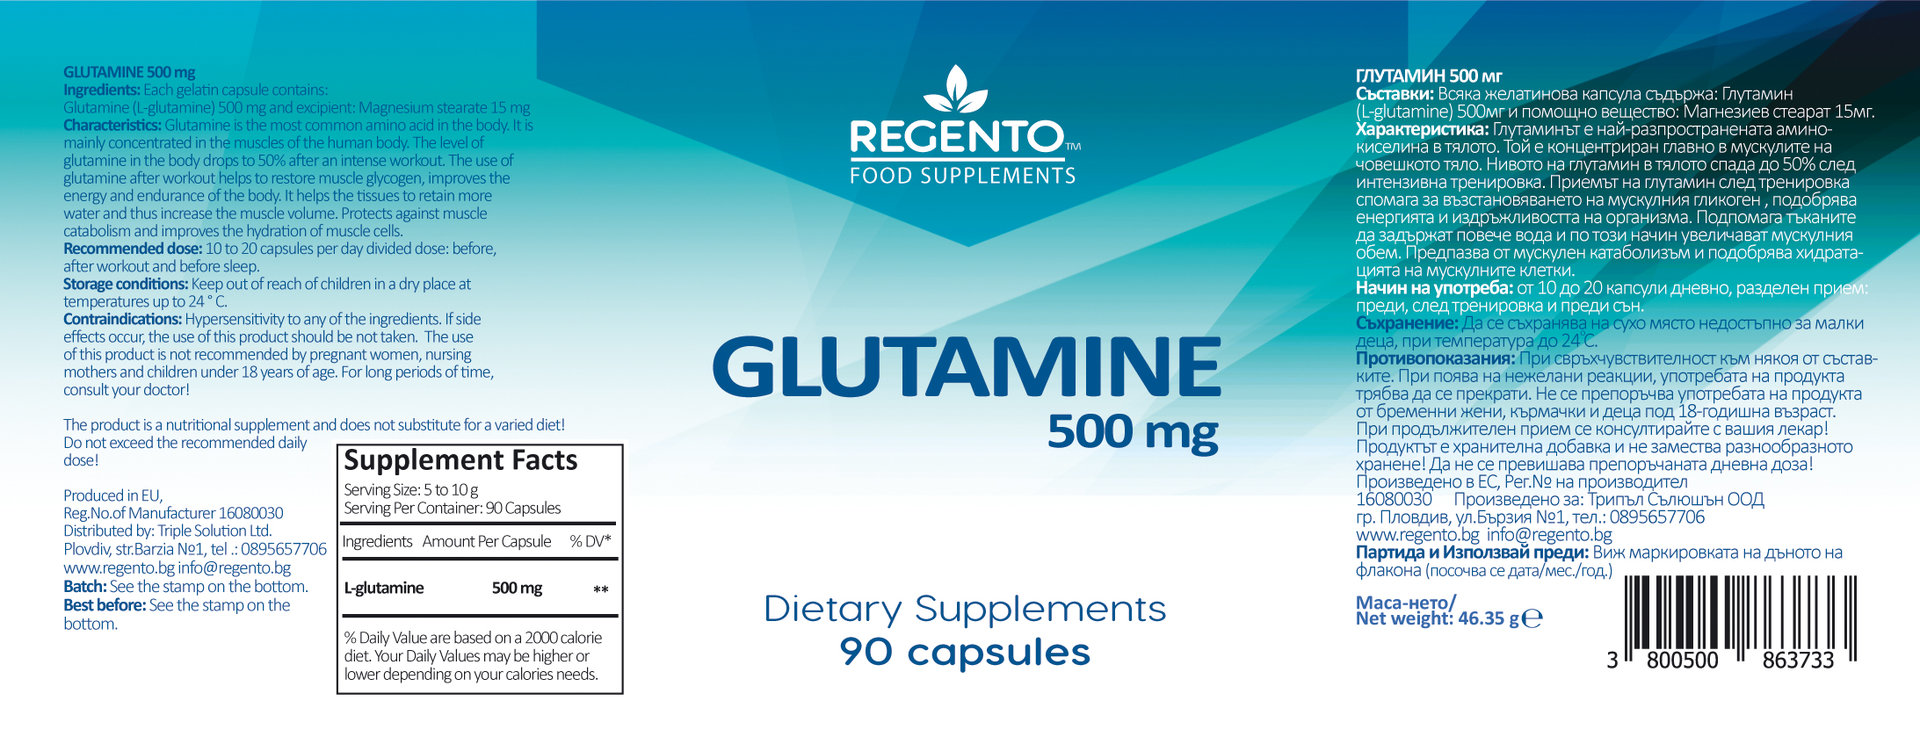 REGENTO GLUTAMINE 500mg 90 capsules